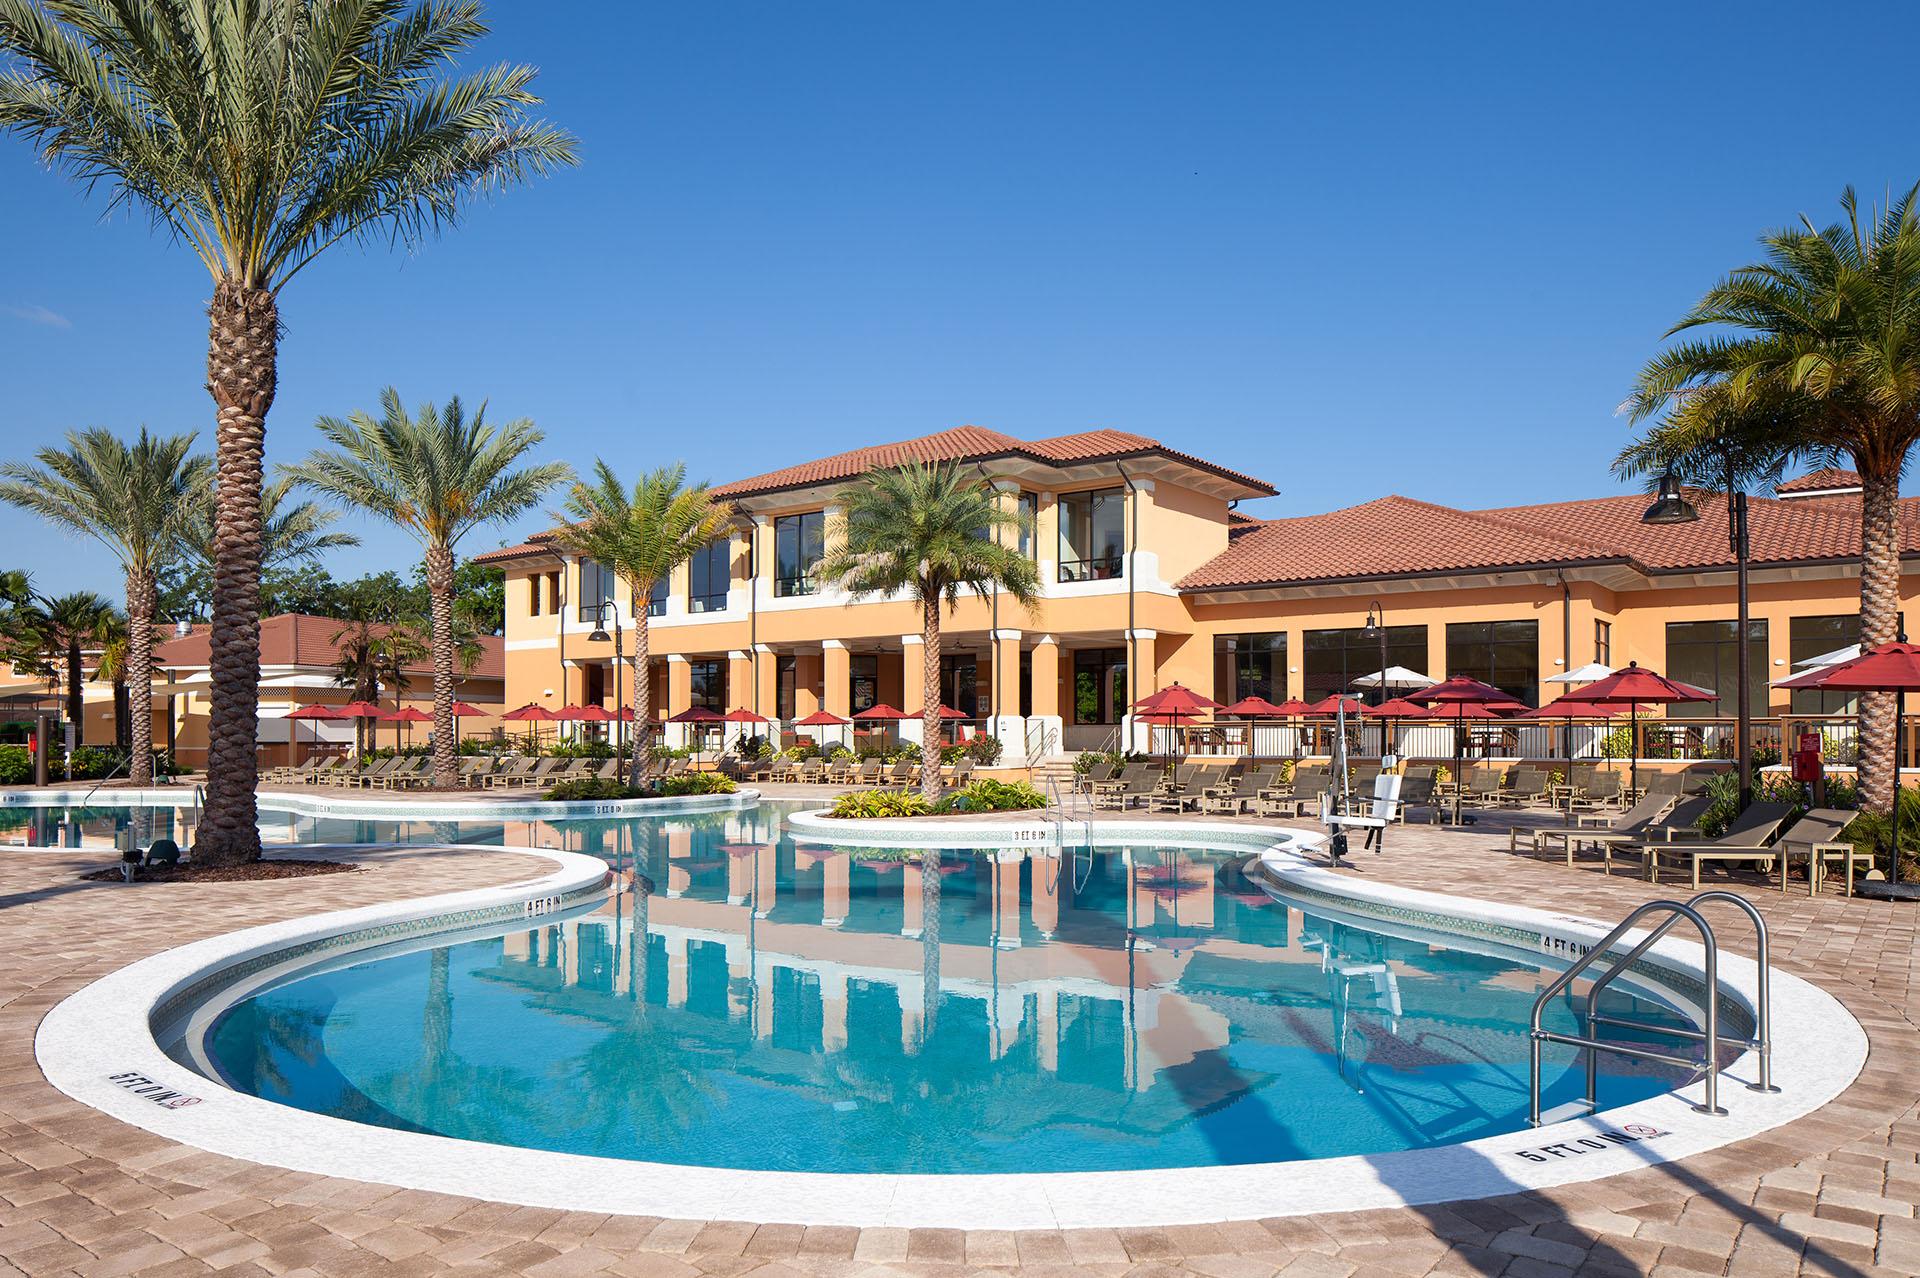 Regal Oaks - Kissimmee, Florida